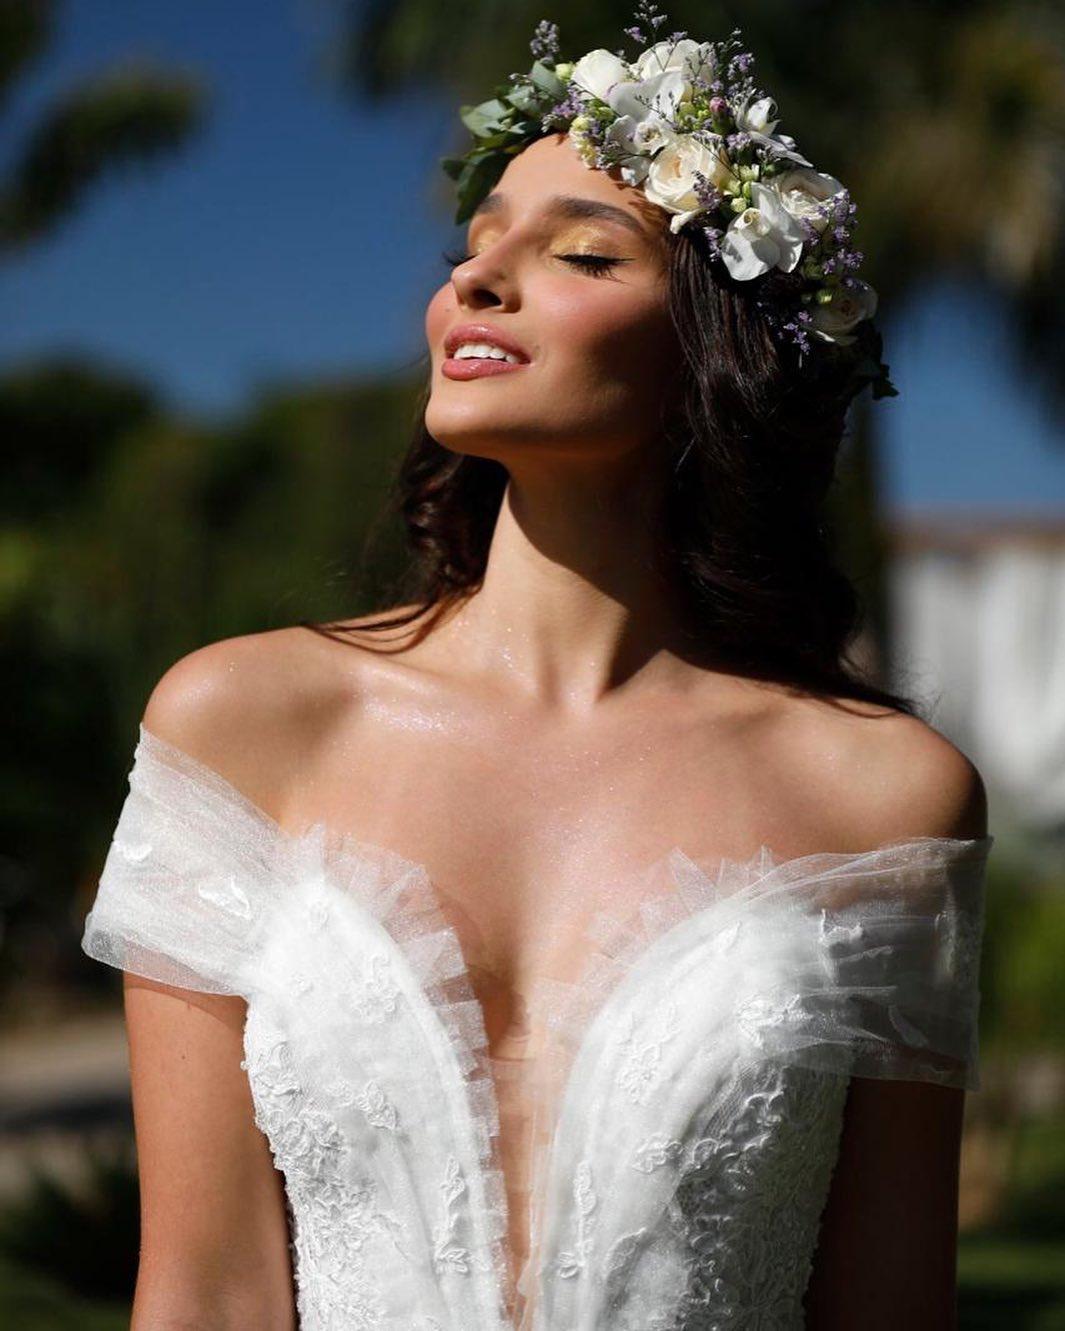 luma russo, top 3 de miss supranational brazil 2020. 62383110